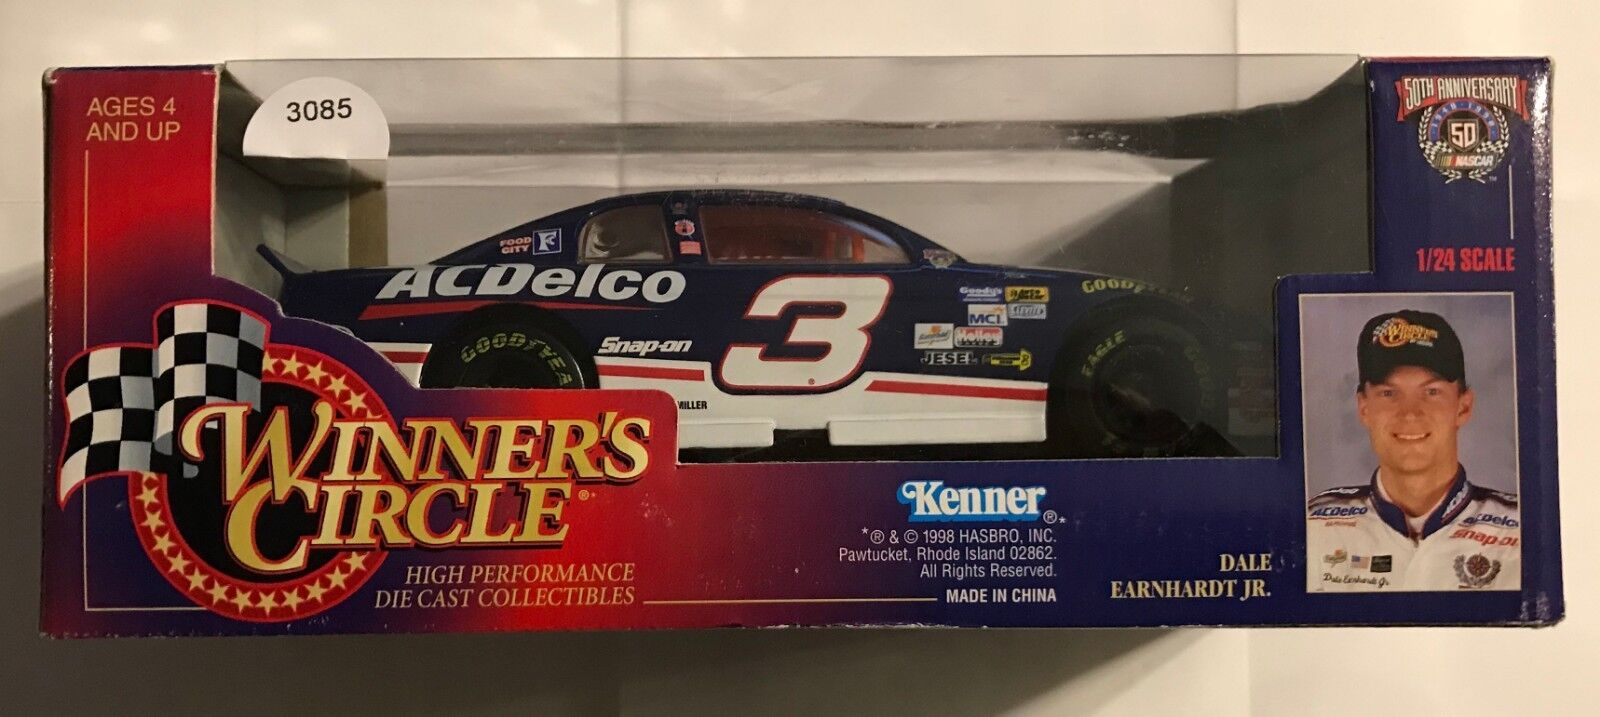 1998 WINNER'S CIRCLE   3 DALE EARNHARDT,JR. - ACDelco - 1 24TH     3085